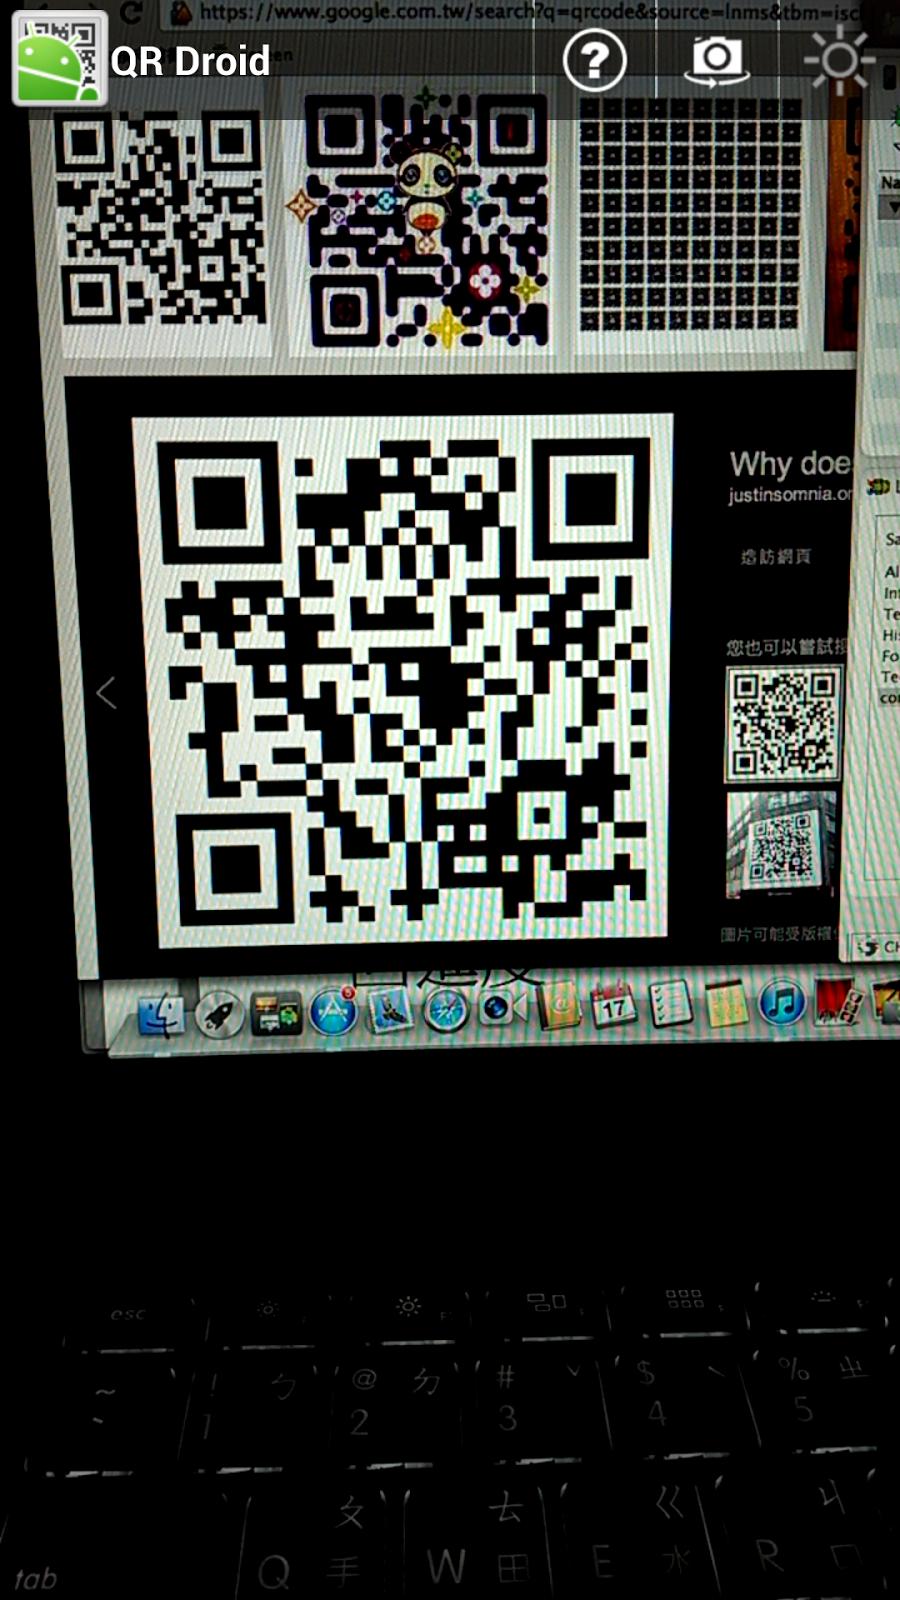 potato papa: Android App 讀取及產生 QR-Code (一)